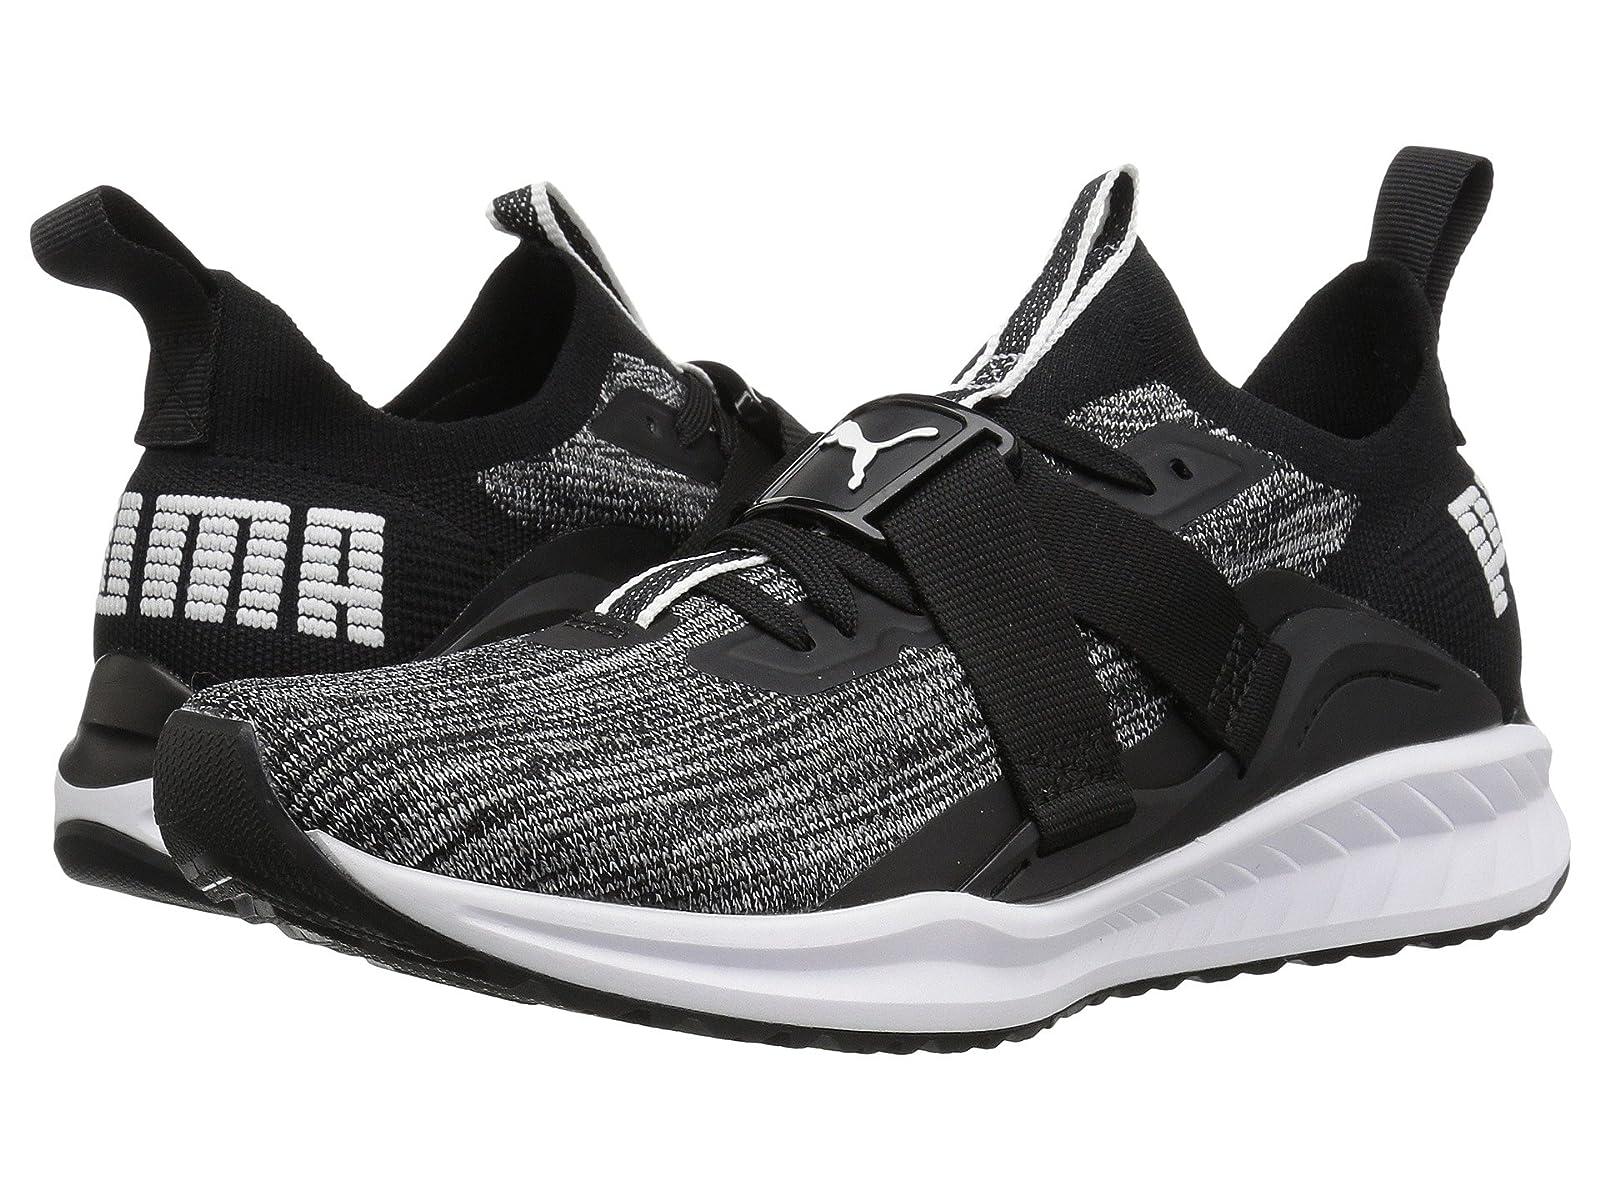 PUMA Ignite evoKNIT Lo 2Cheap and distinctive eye-catching shoes